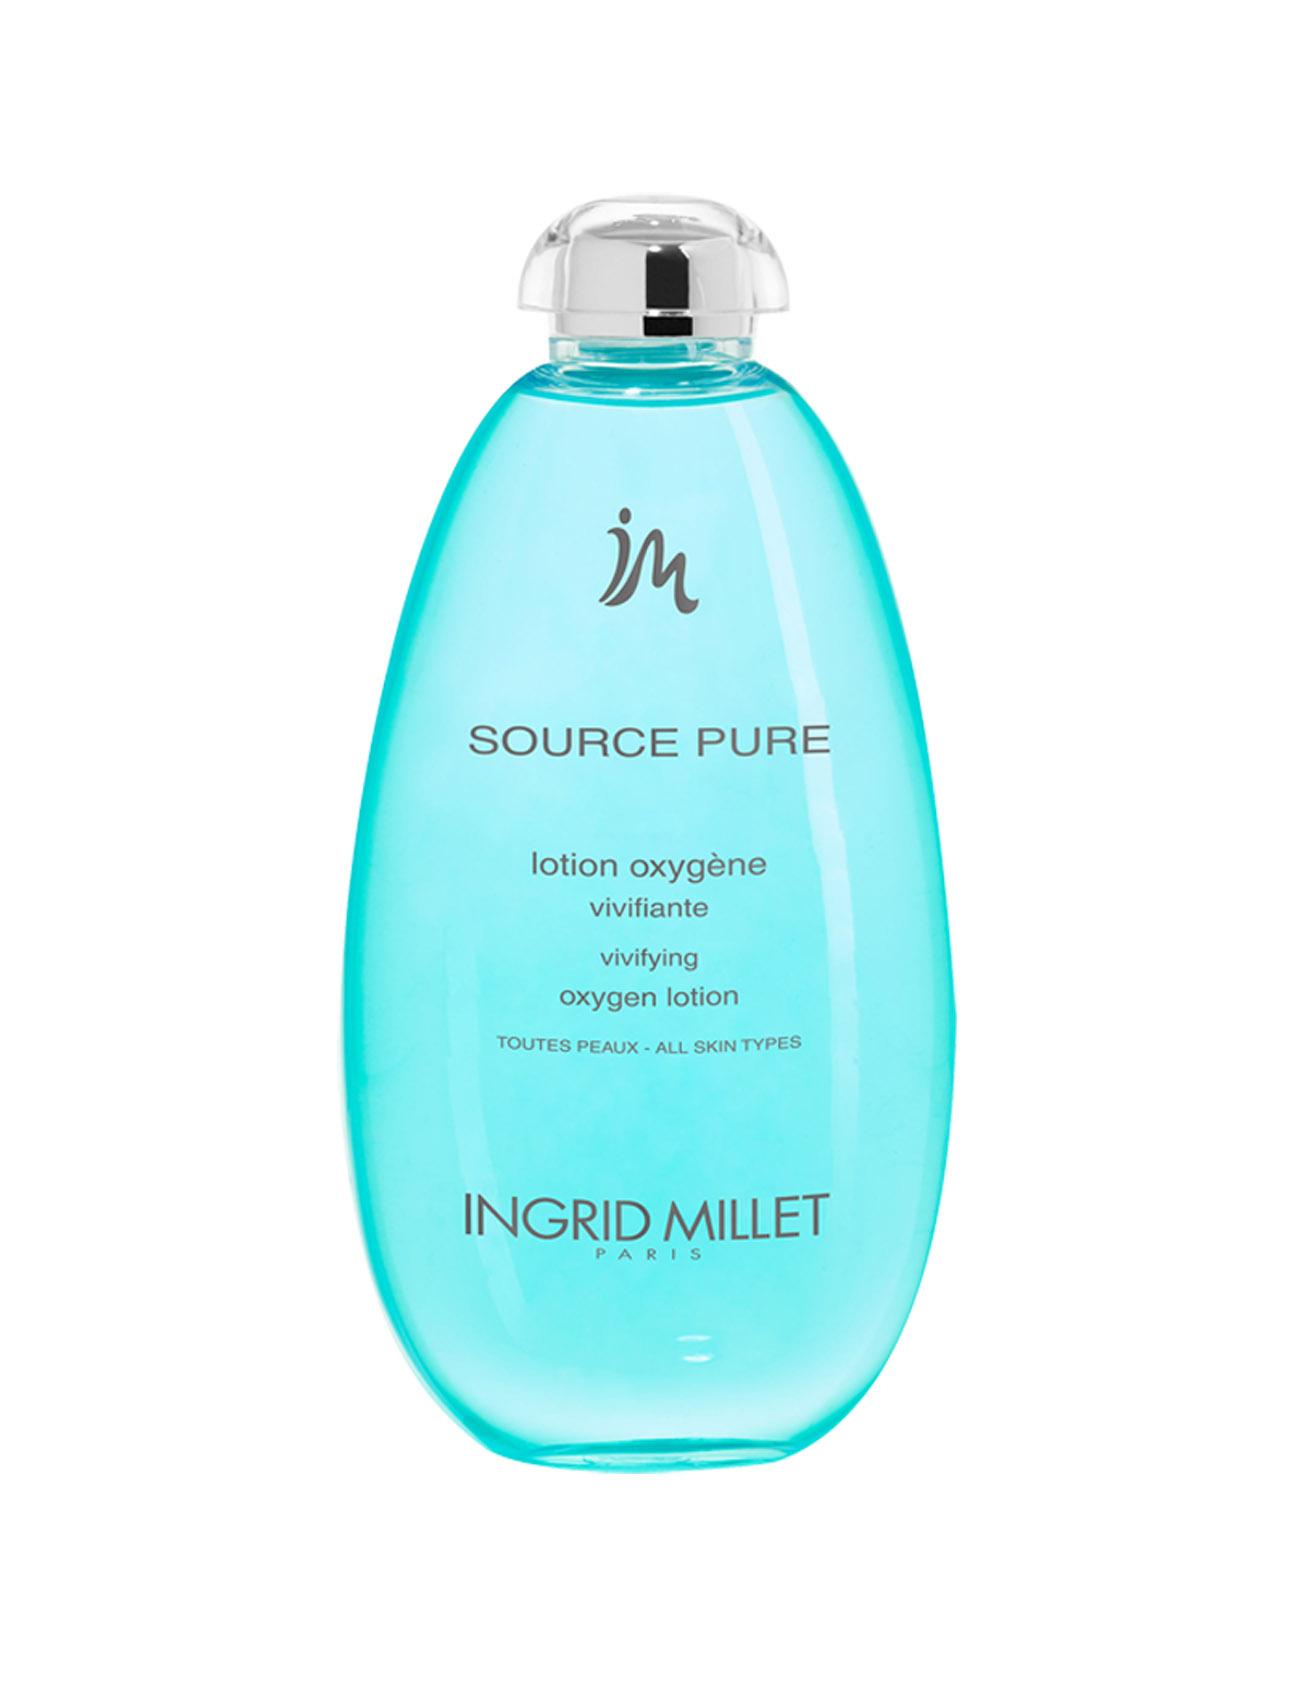 5-Lotion-Oxygene-Tonico-purificante-Ingrid-Millet-Linea-cosmetici-di-lusso-Source-Pure-Dispar-SpA.jpg